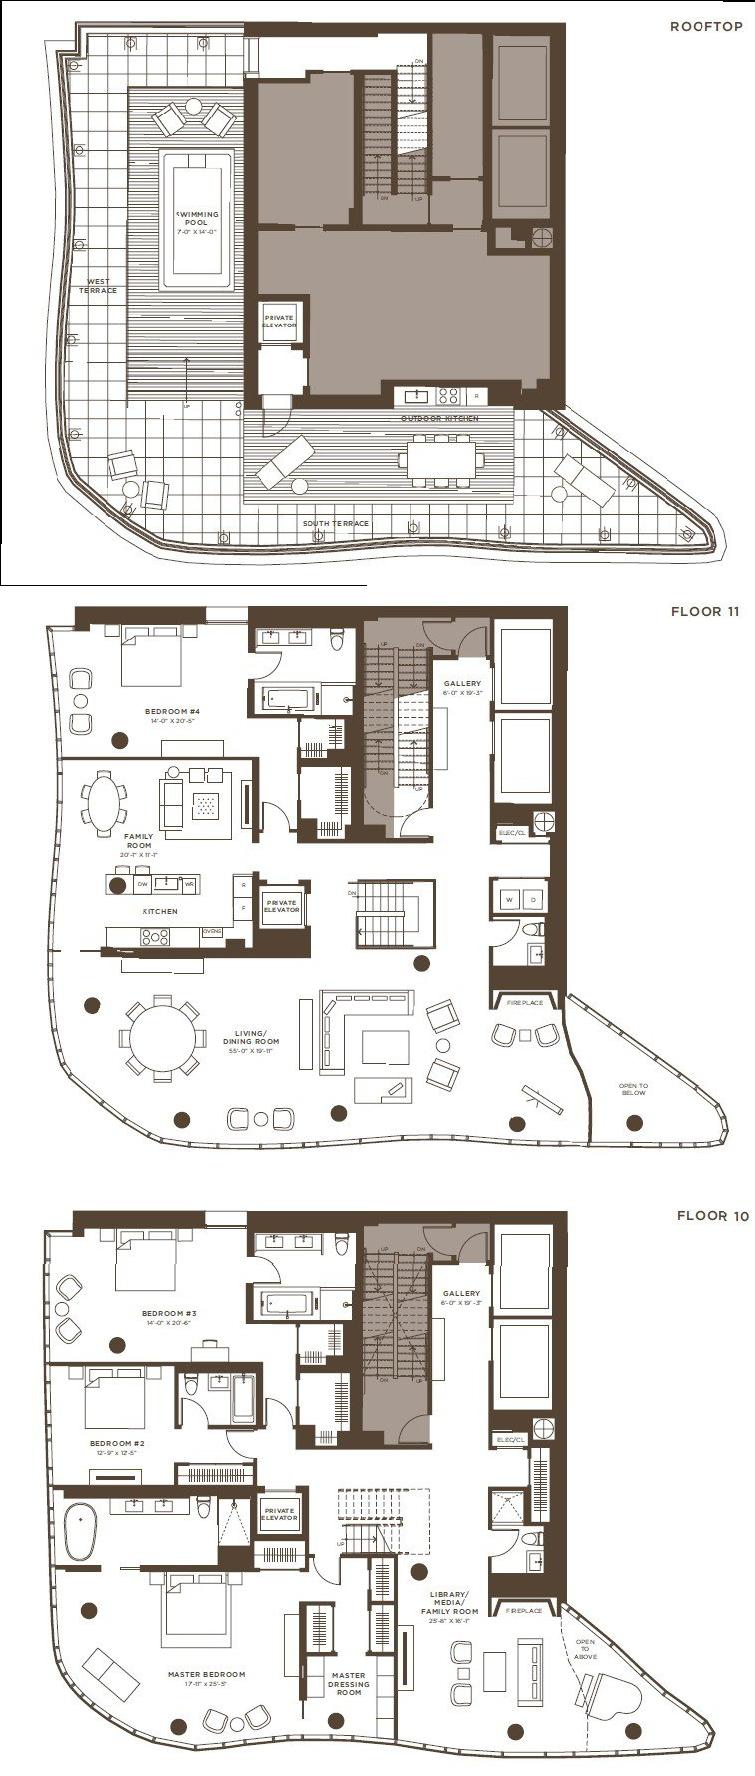 Home plans one jackson square kpf architect drawing jackson square penthouses condominium floor